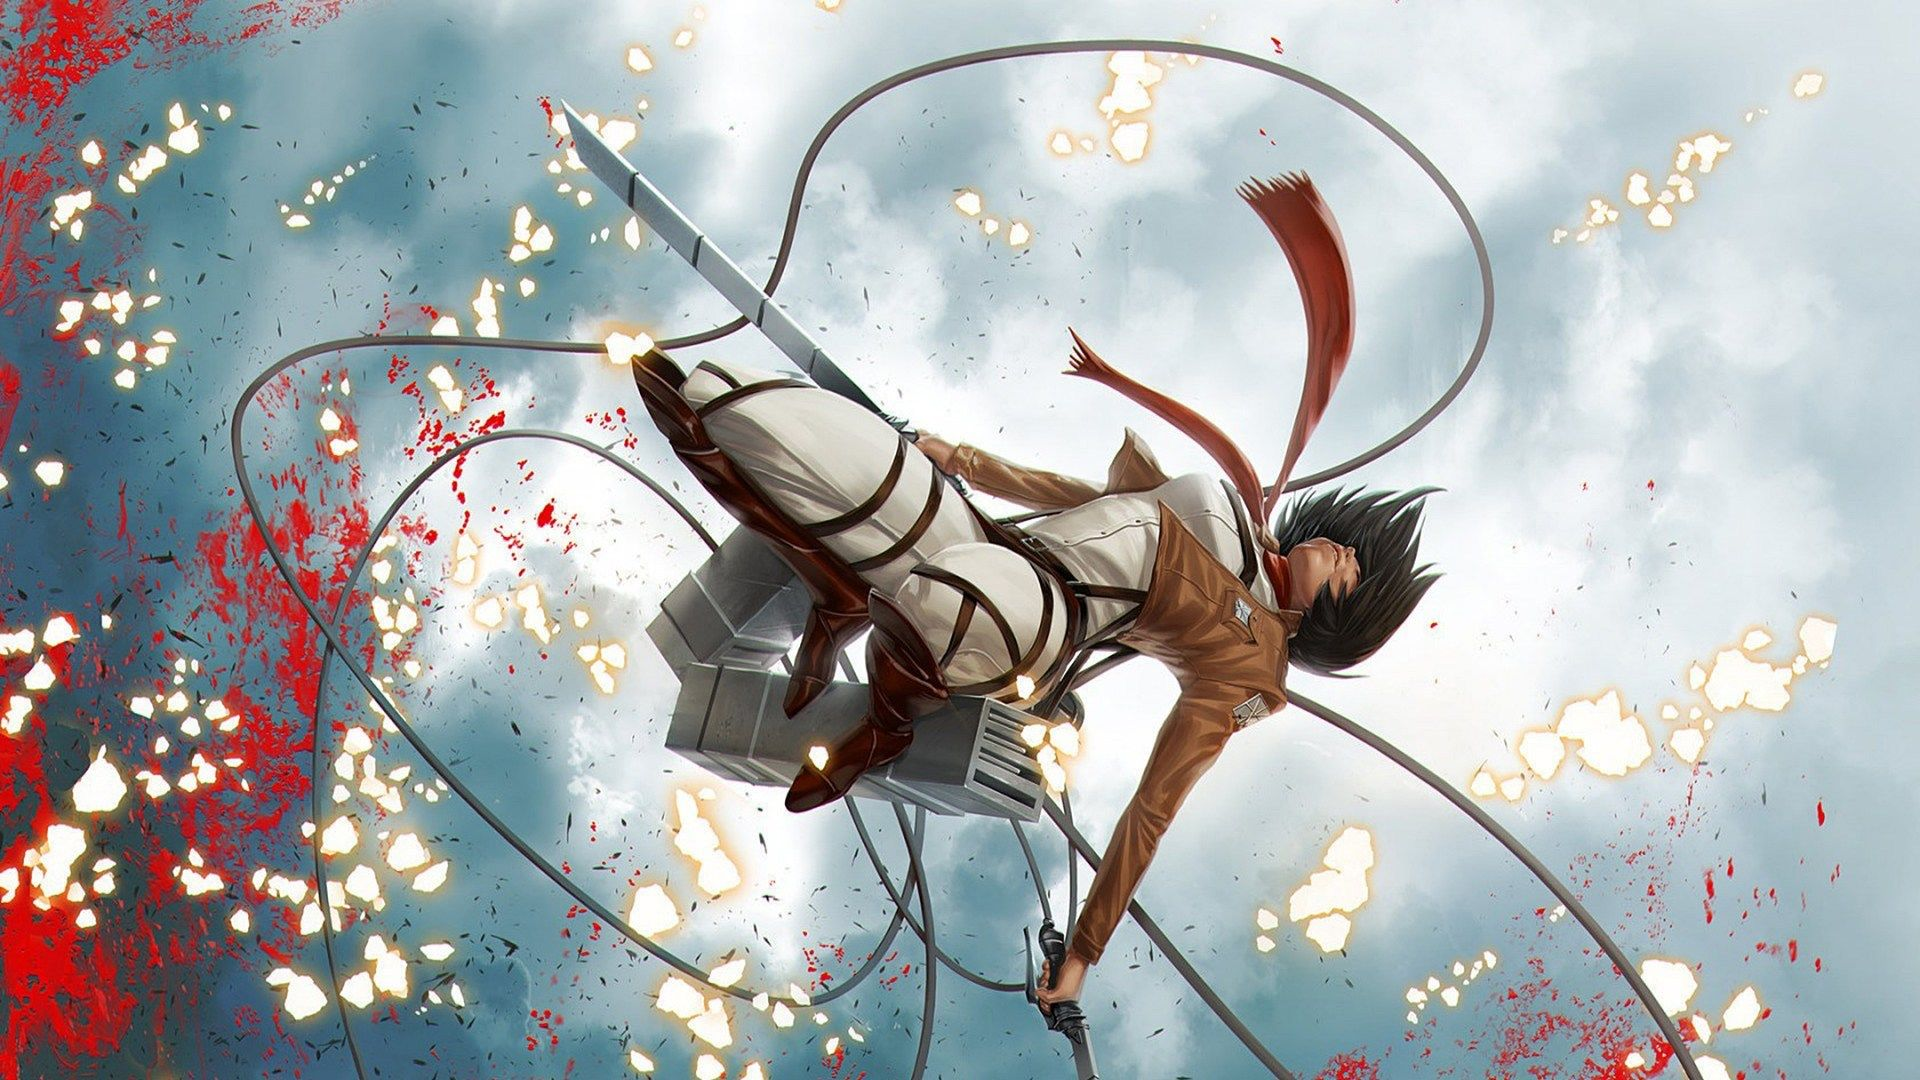 Attack On Titan Mikasa Wallpapers On Wallpaperdog